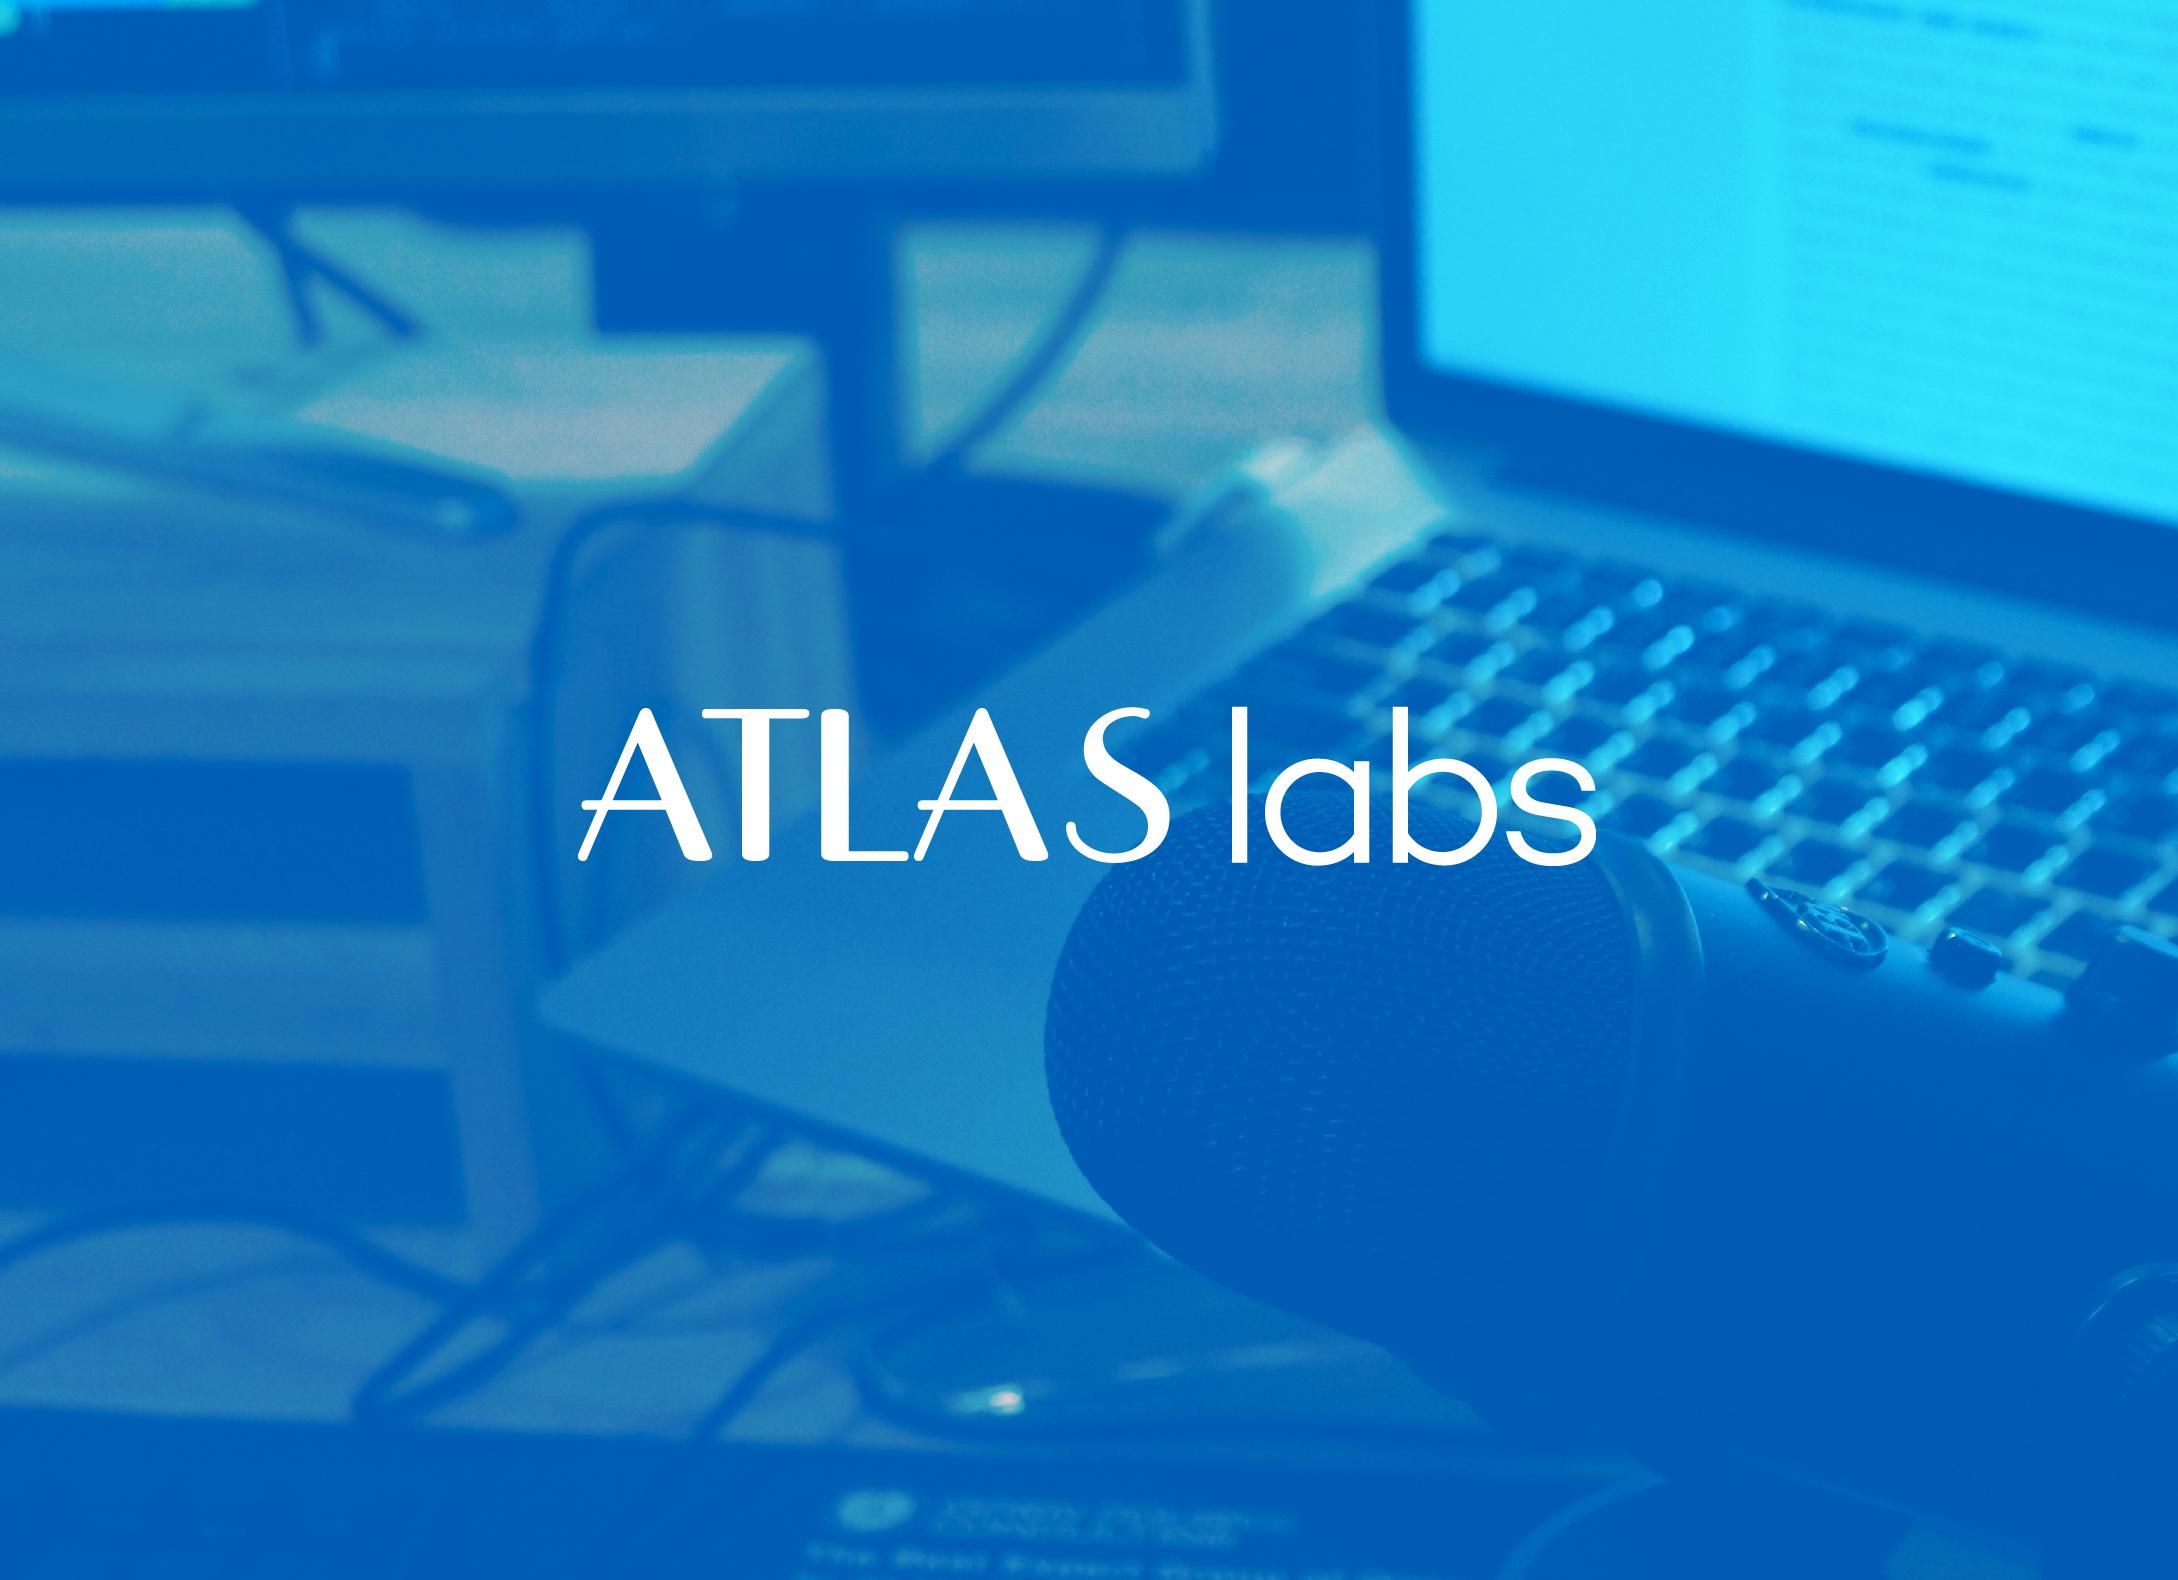 Atlas Labs